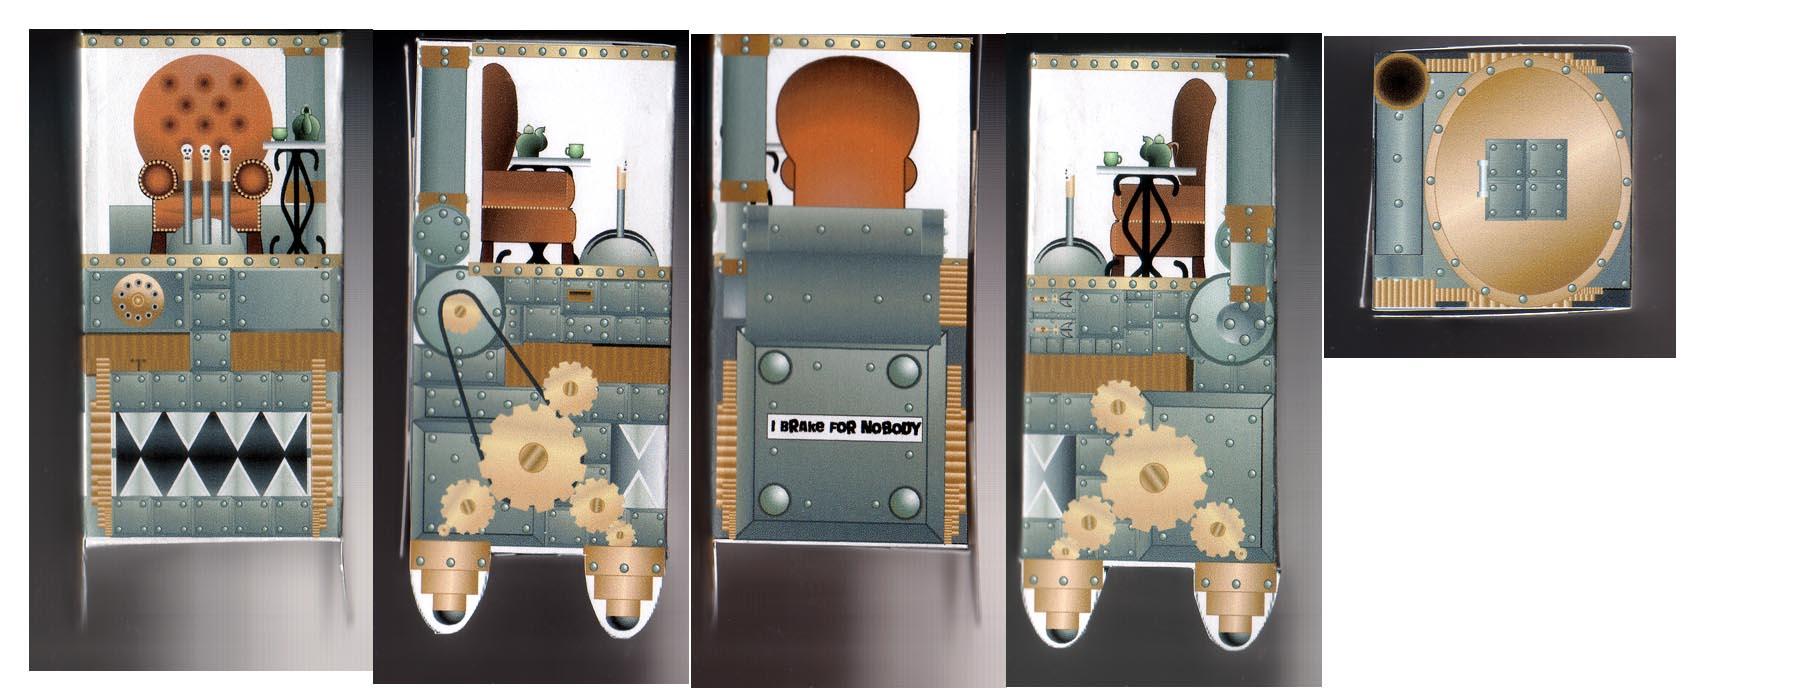 July 2009 Papercraft Entry